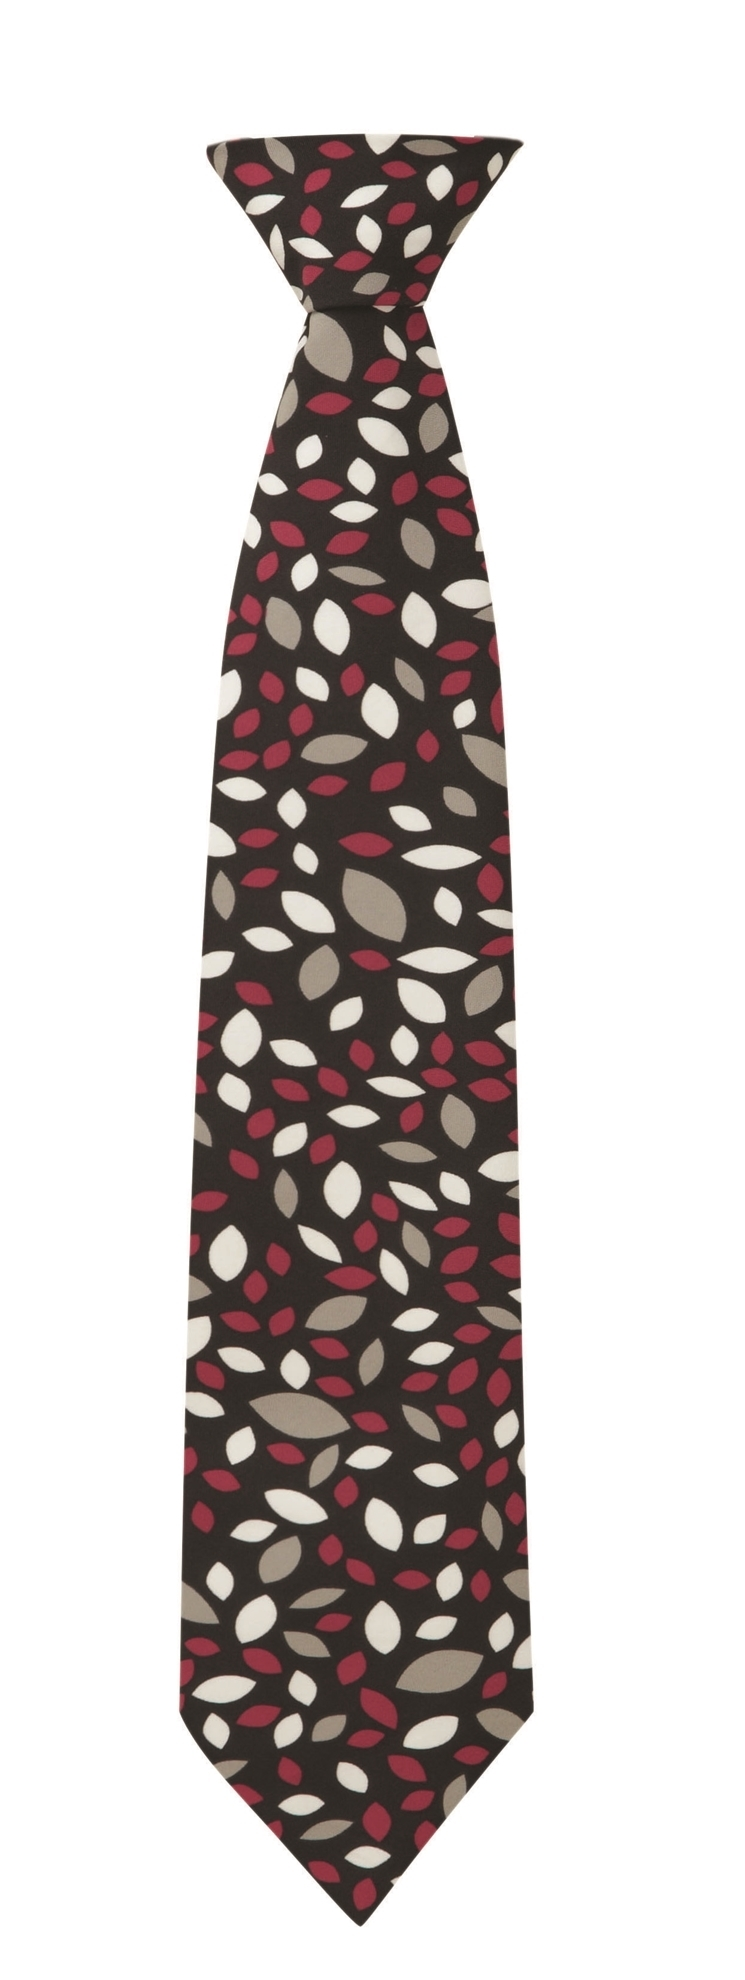 Picture of Print Tie - Black/Cerise Lauren Print